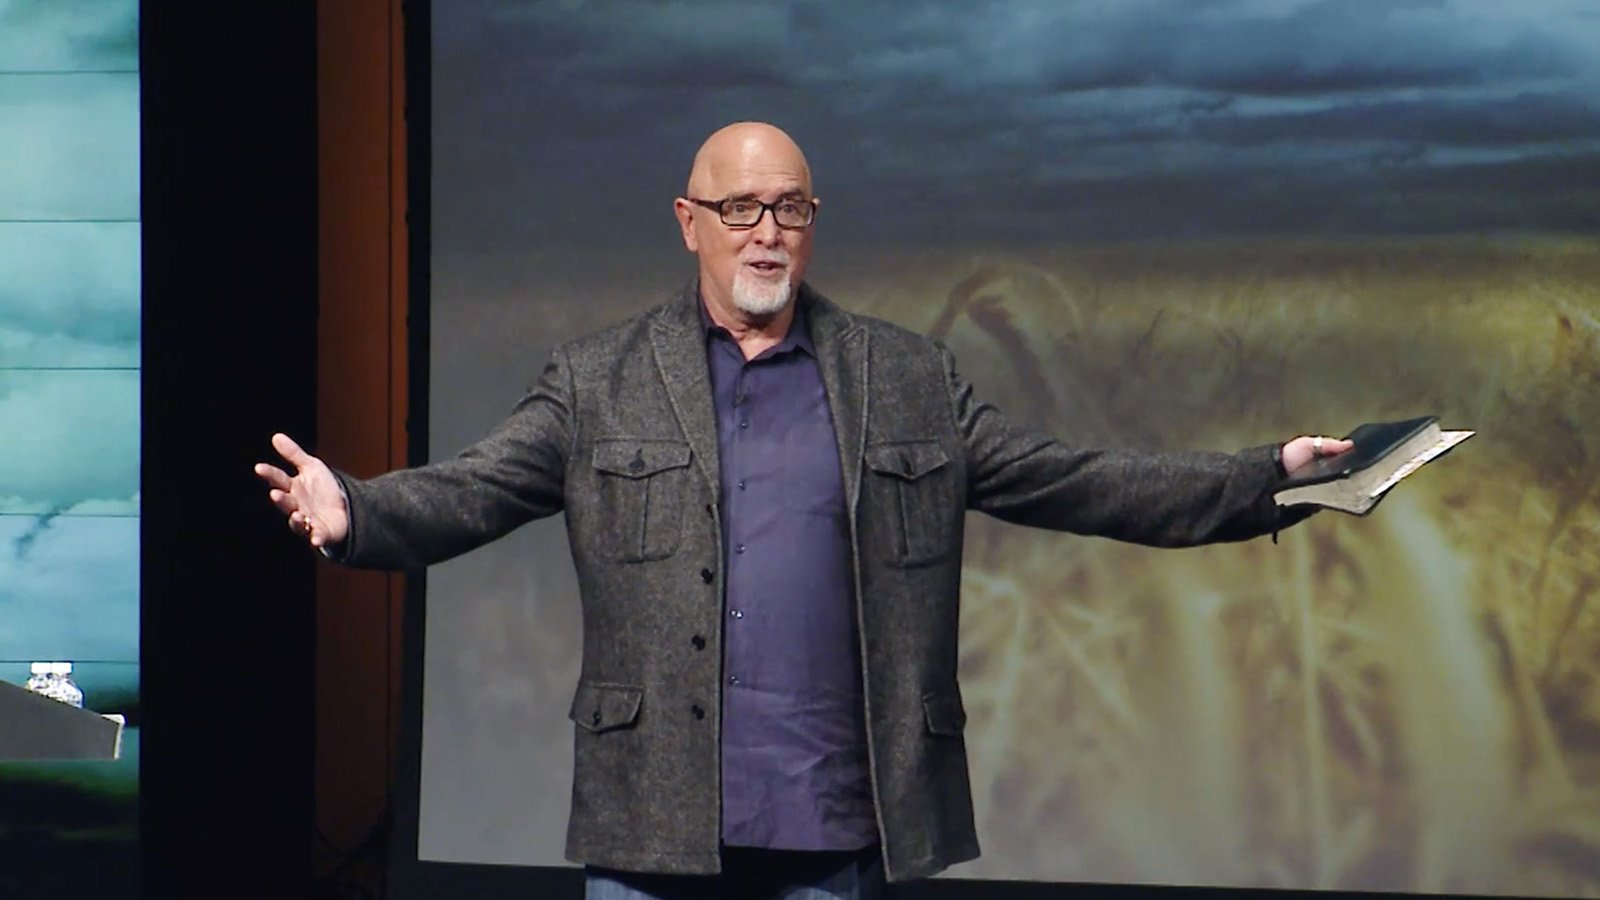 James MacDonald fired as Harvest Bible Chapel pastor